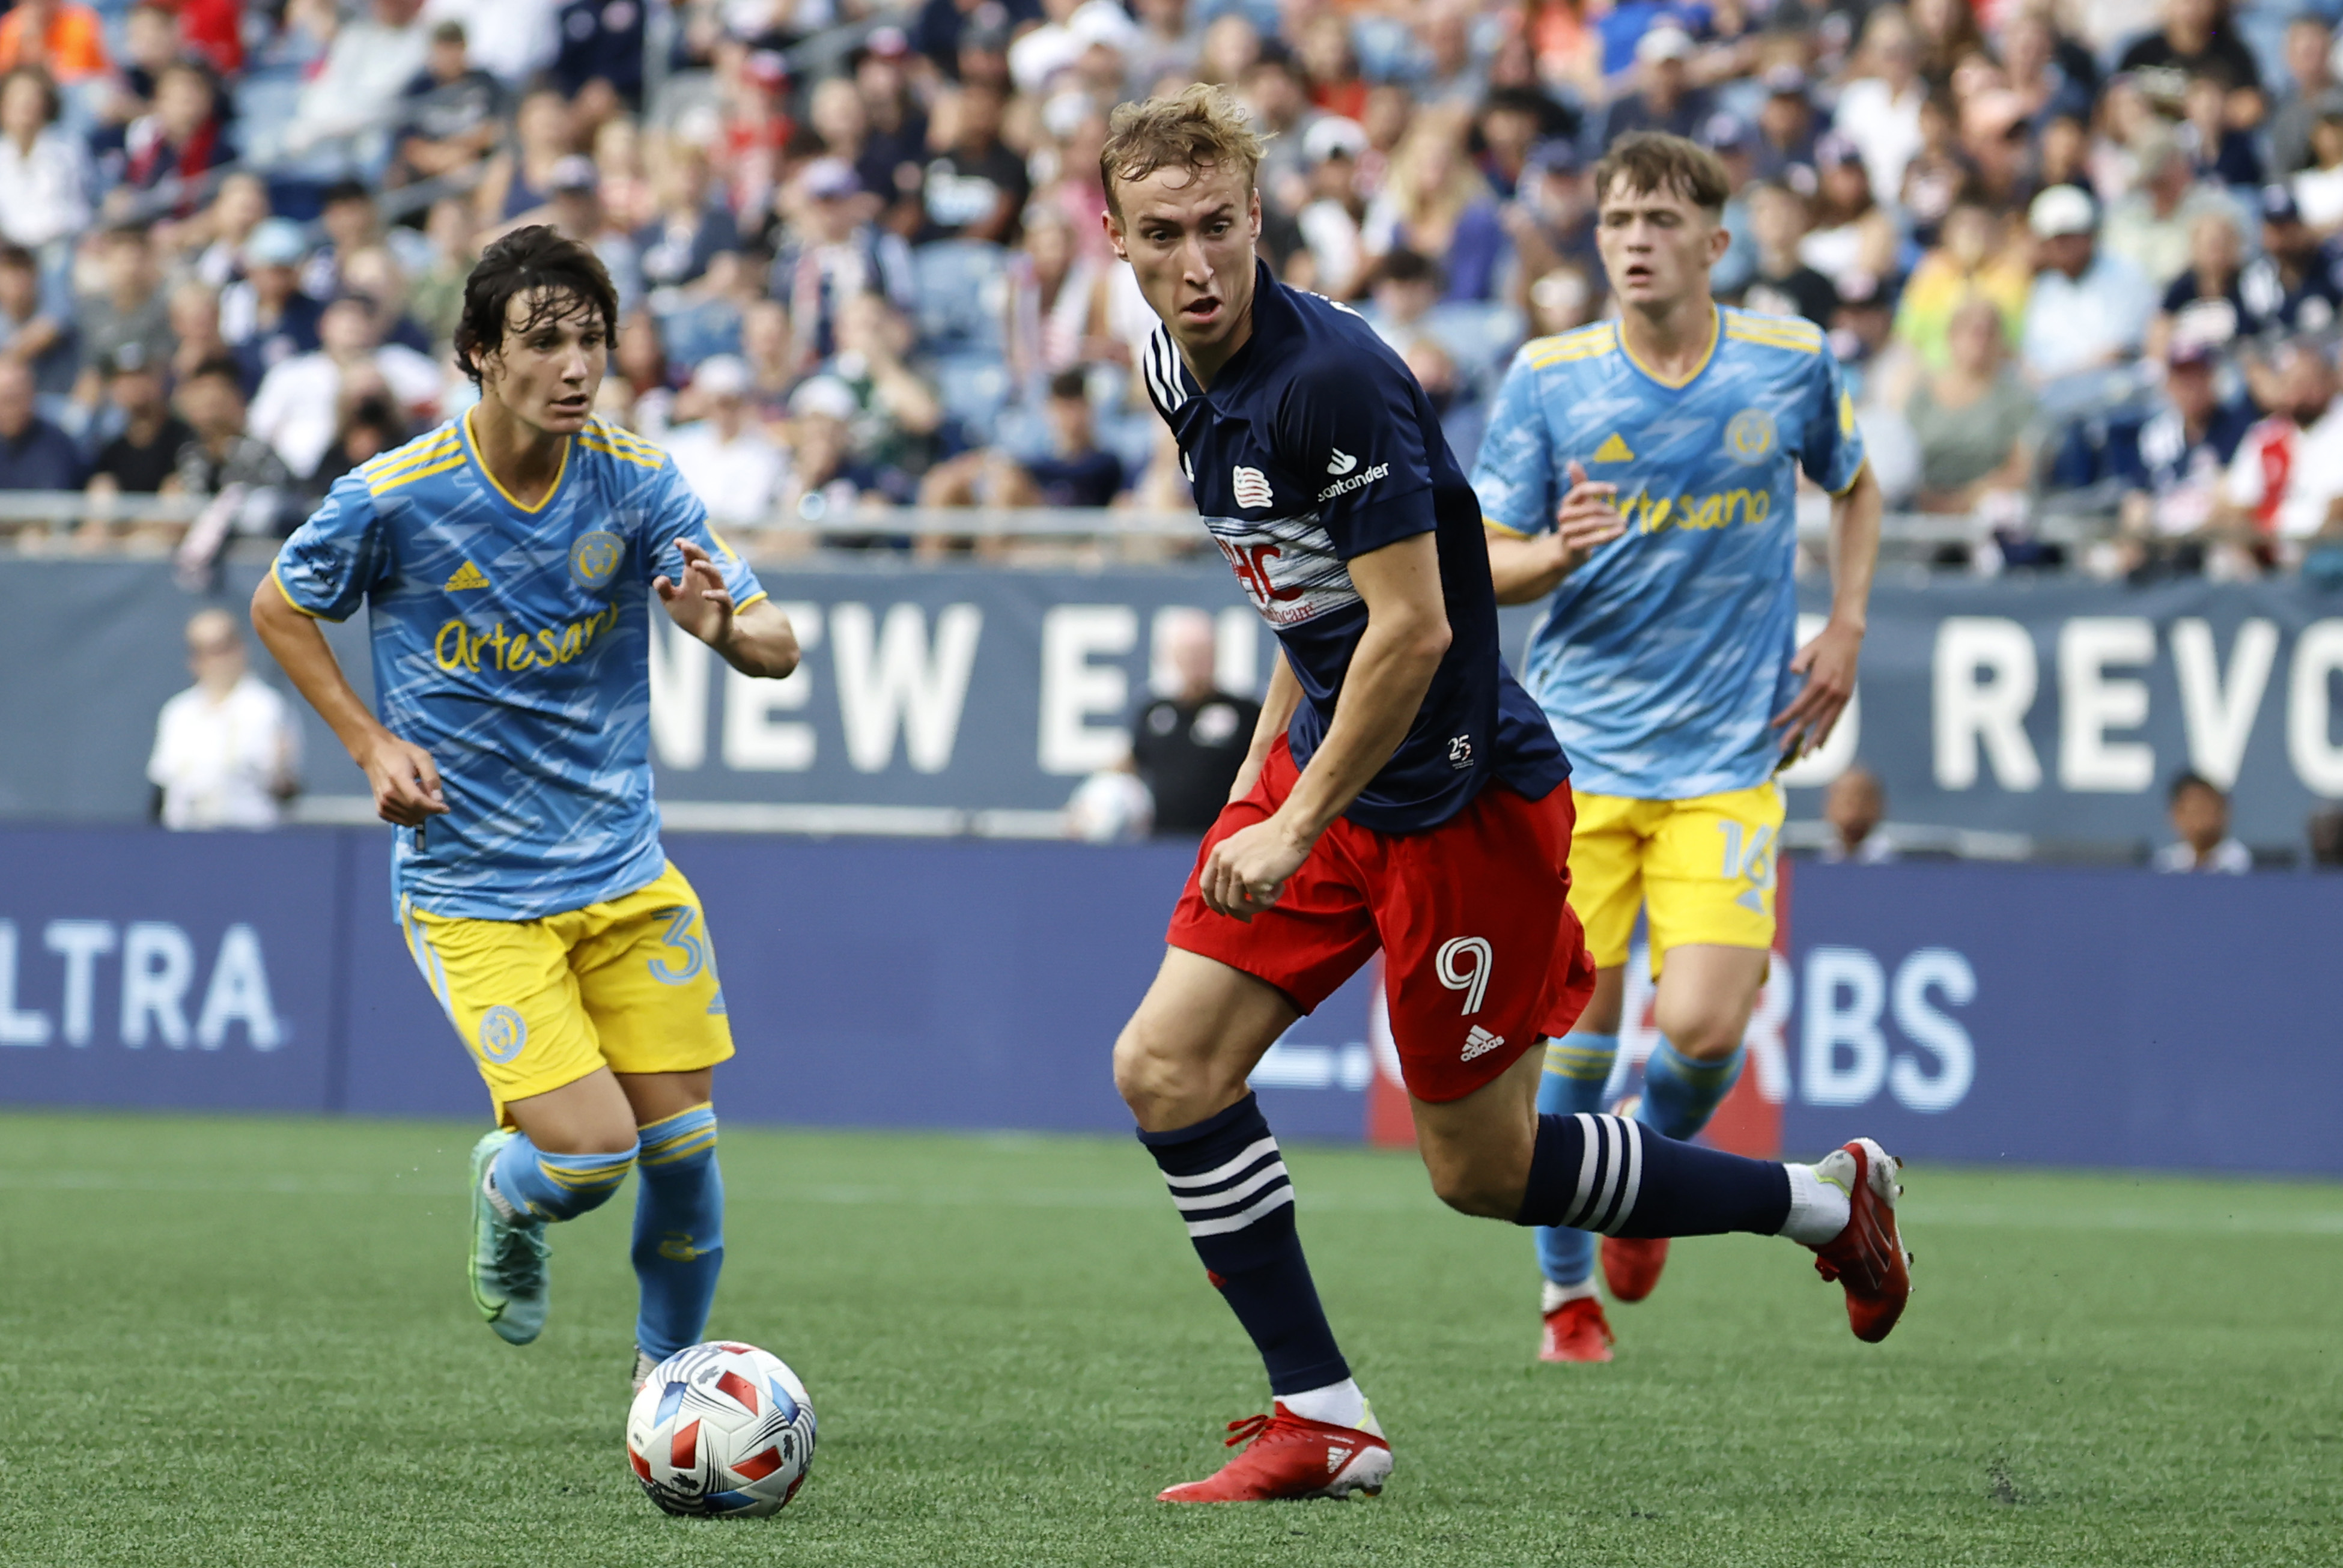 SOCCER: AUG 08 MLS - Philadelphia Union at New England Revolution